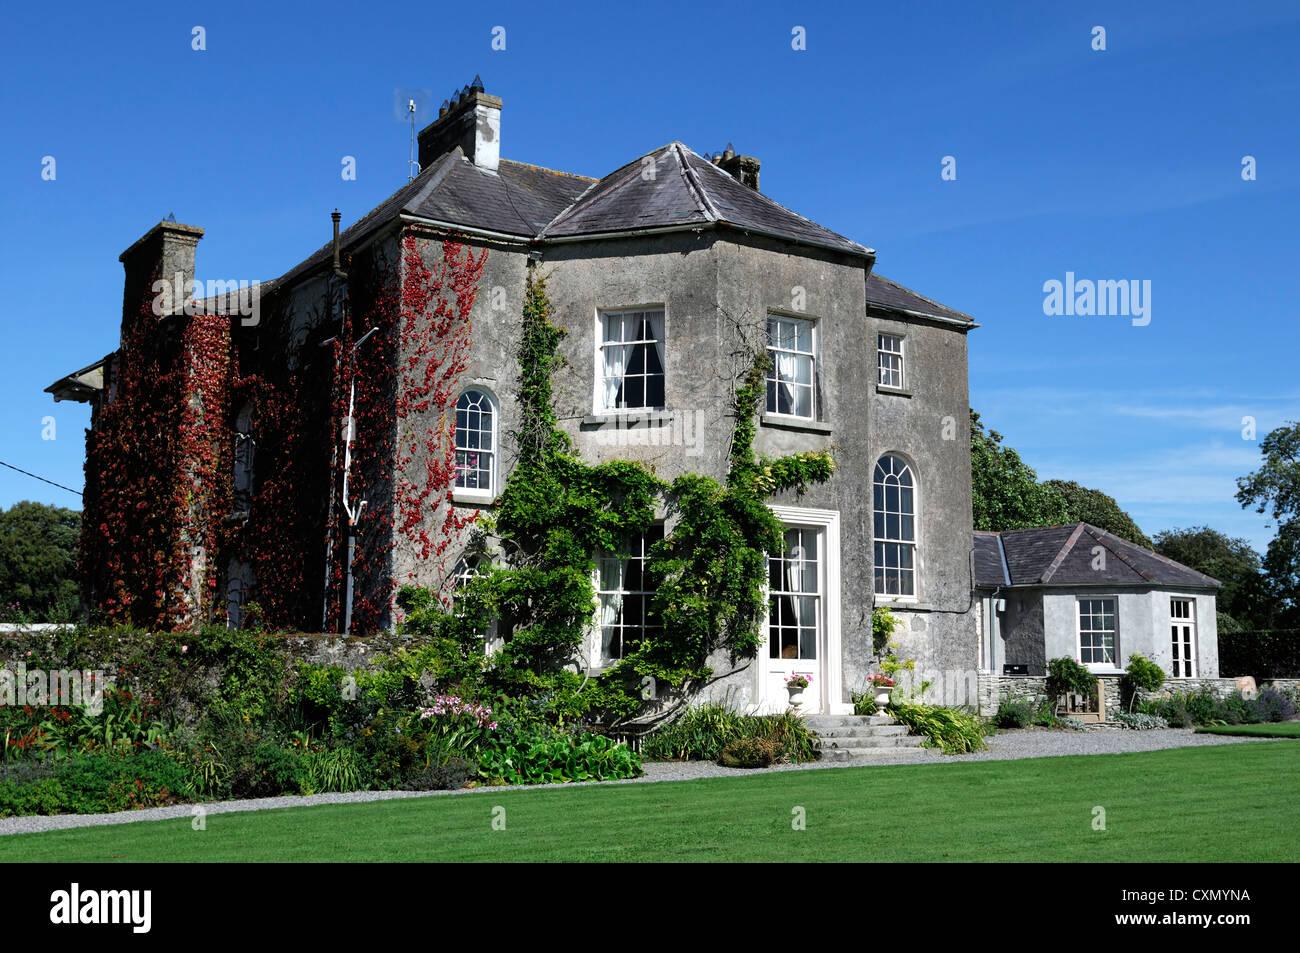 Burton House Fennell family home kildare ireland georgian villa gardens quaker robert power - Stock Image